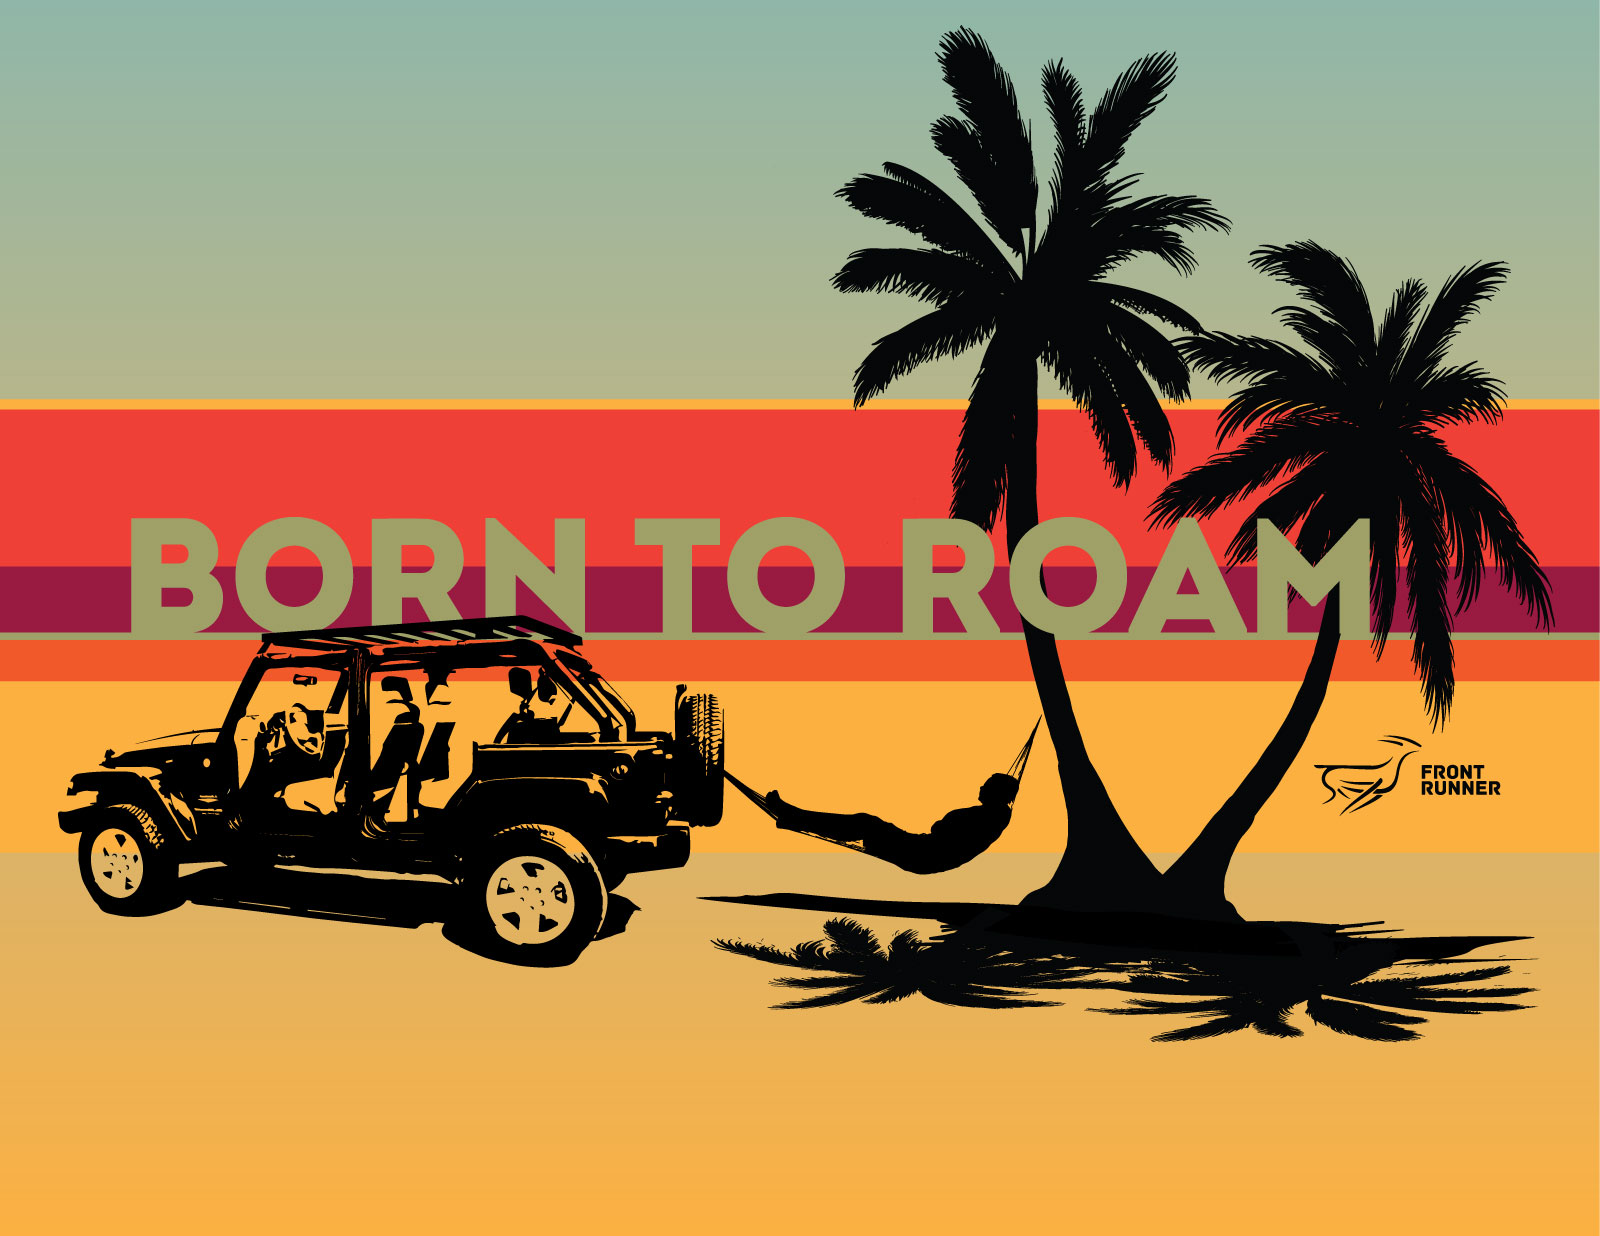 FrontRunner-Born-To-Roam-Jeep-Beach.jpg